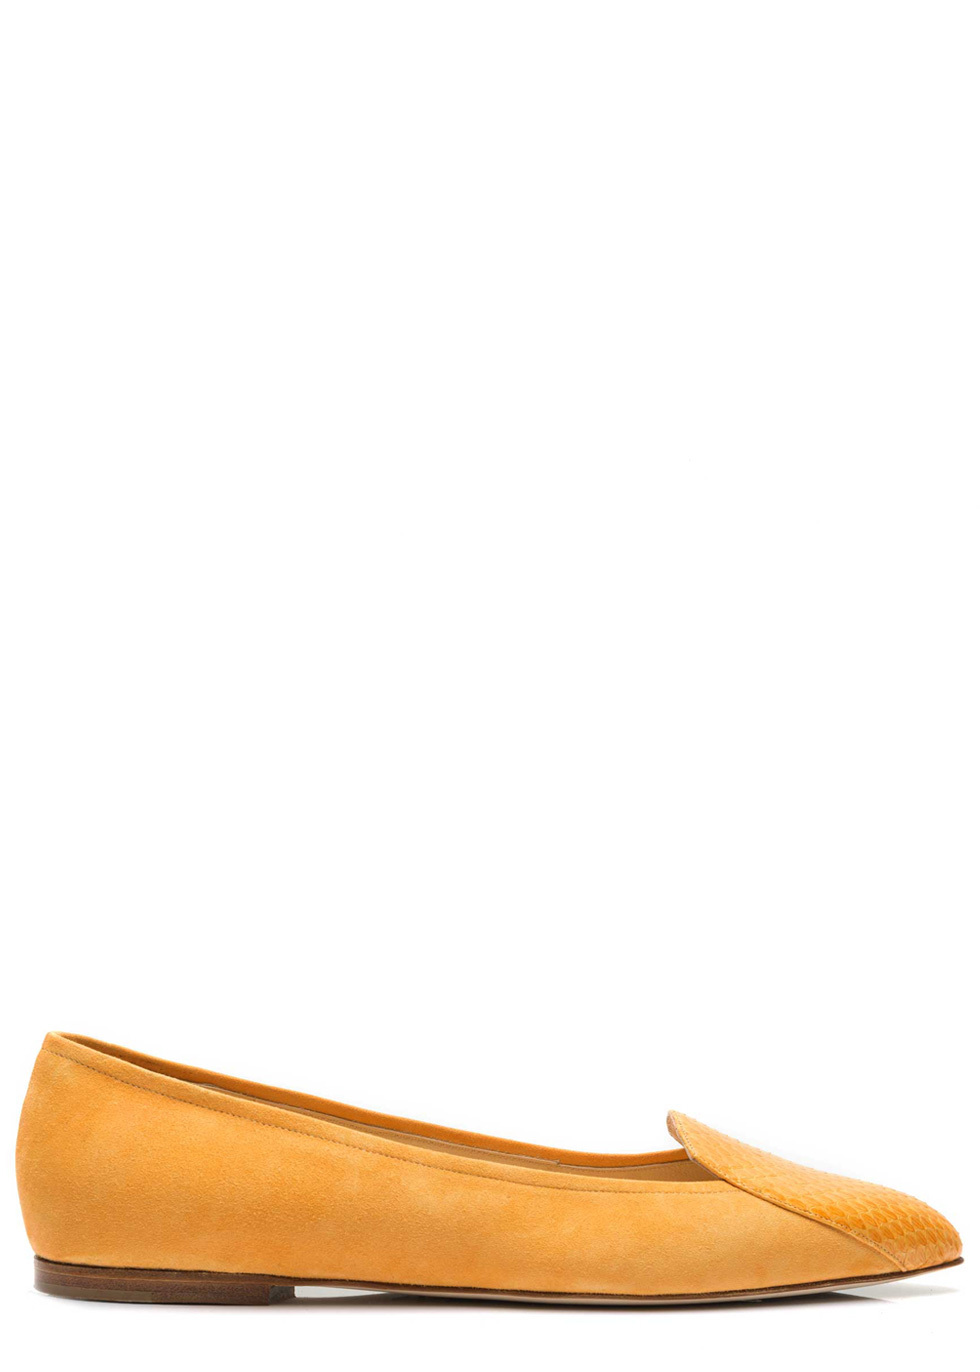 Julia Mays Ellie Striped Elaphe Pointed Toe Flats Browse For Sale fZ8USq